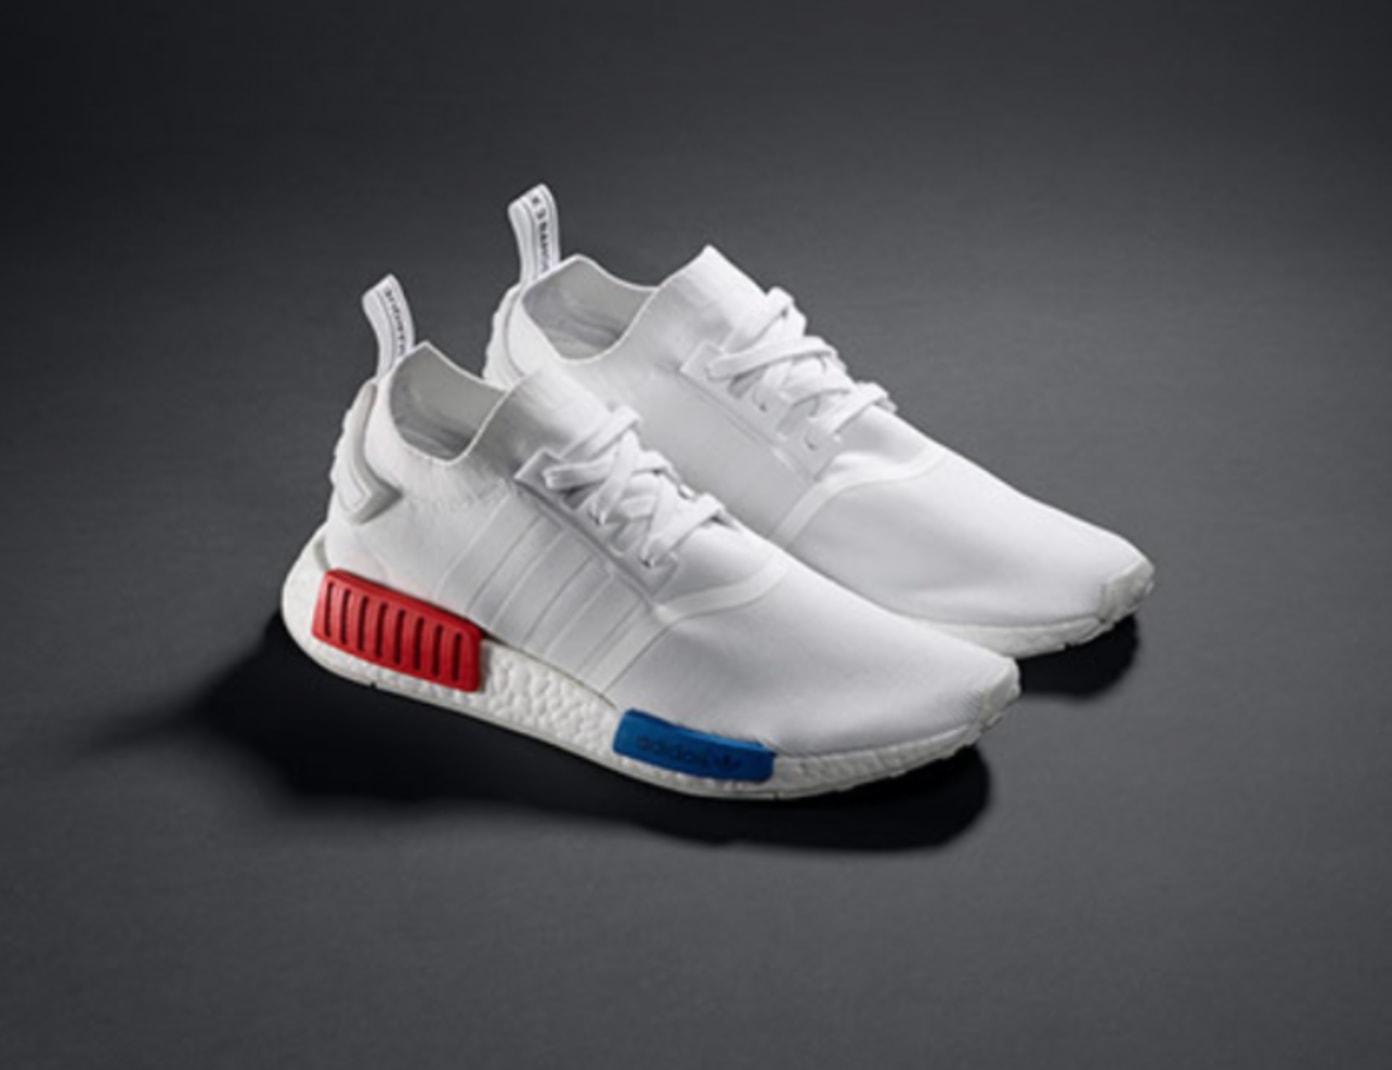 adidas NMD Runner PK White Red Blue